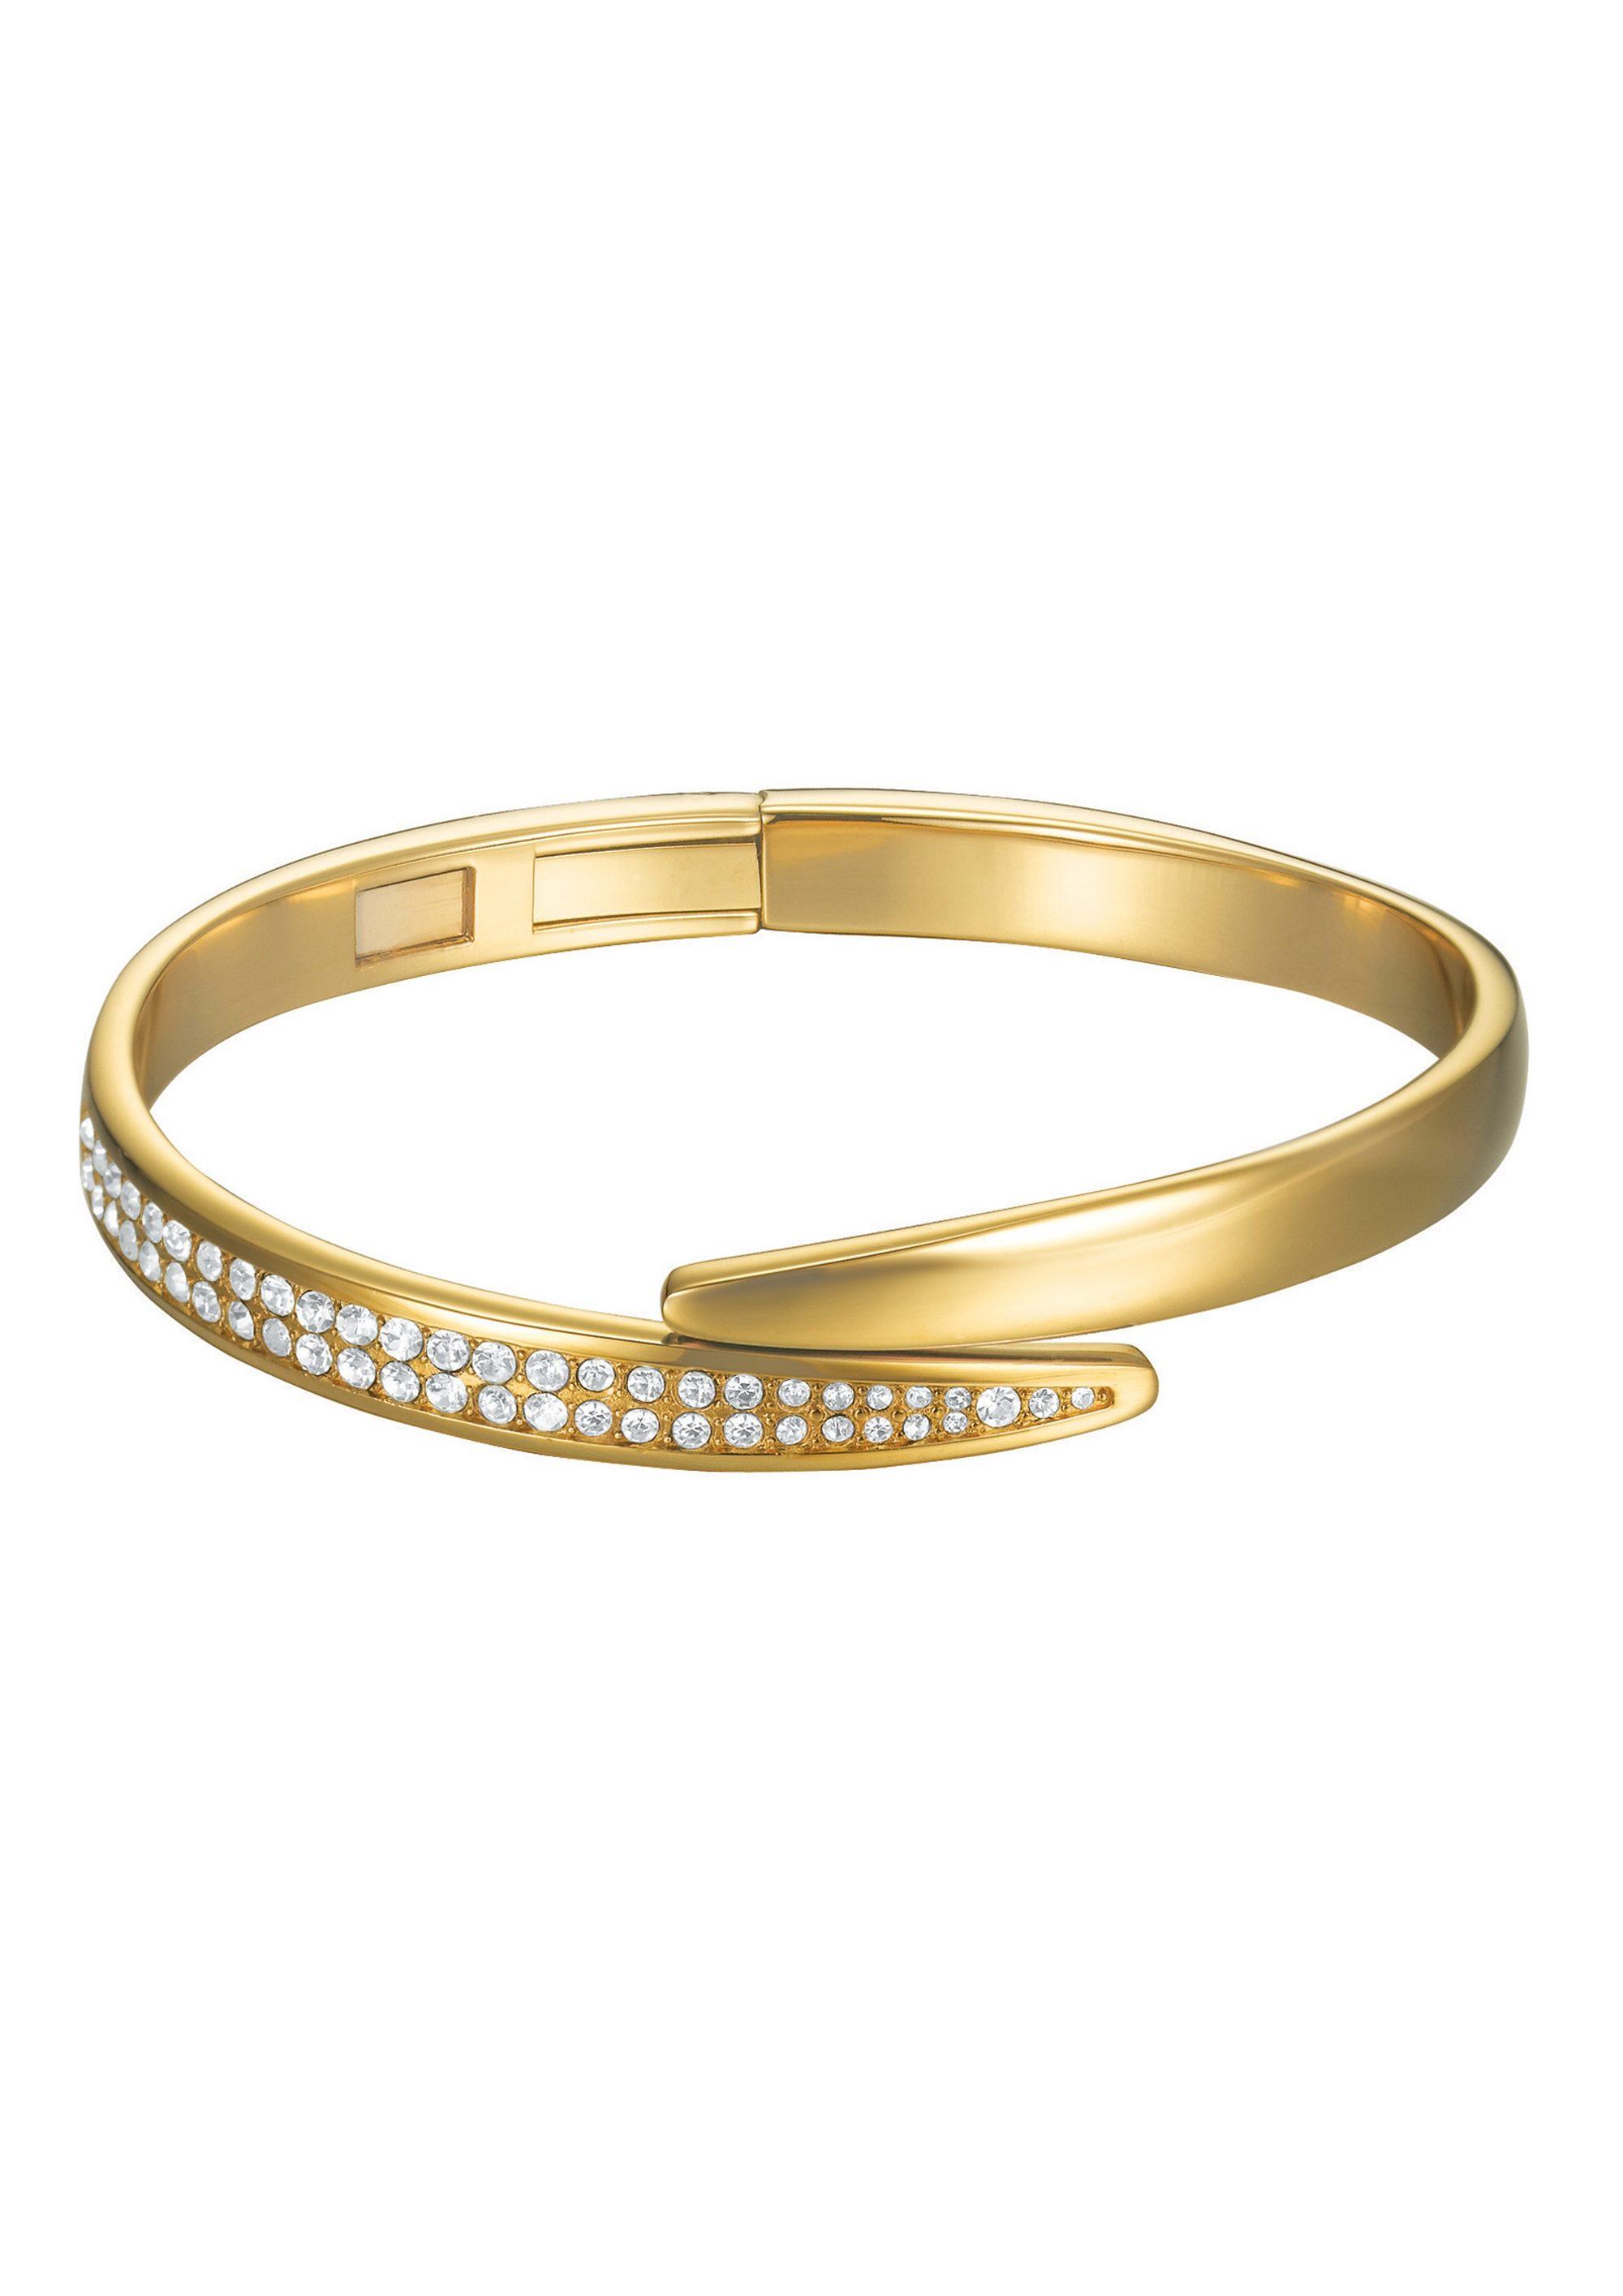 "ESPRIT Armreif ""ESPRIT-JW50031 Gold, ESBA11298B600"""